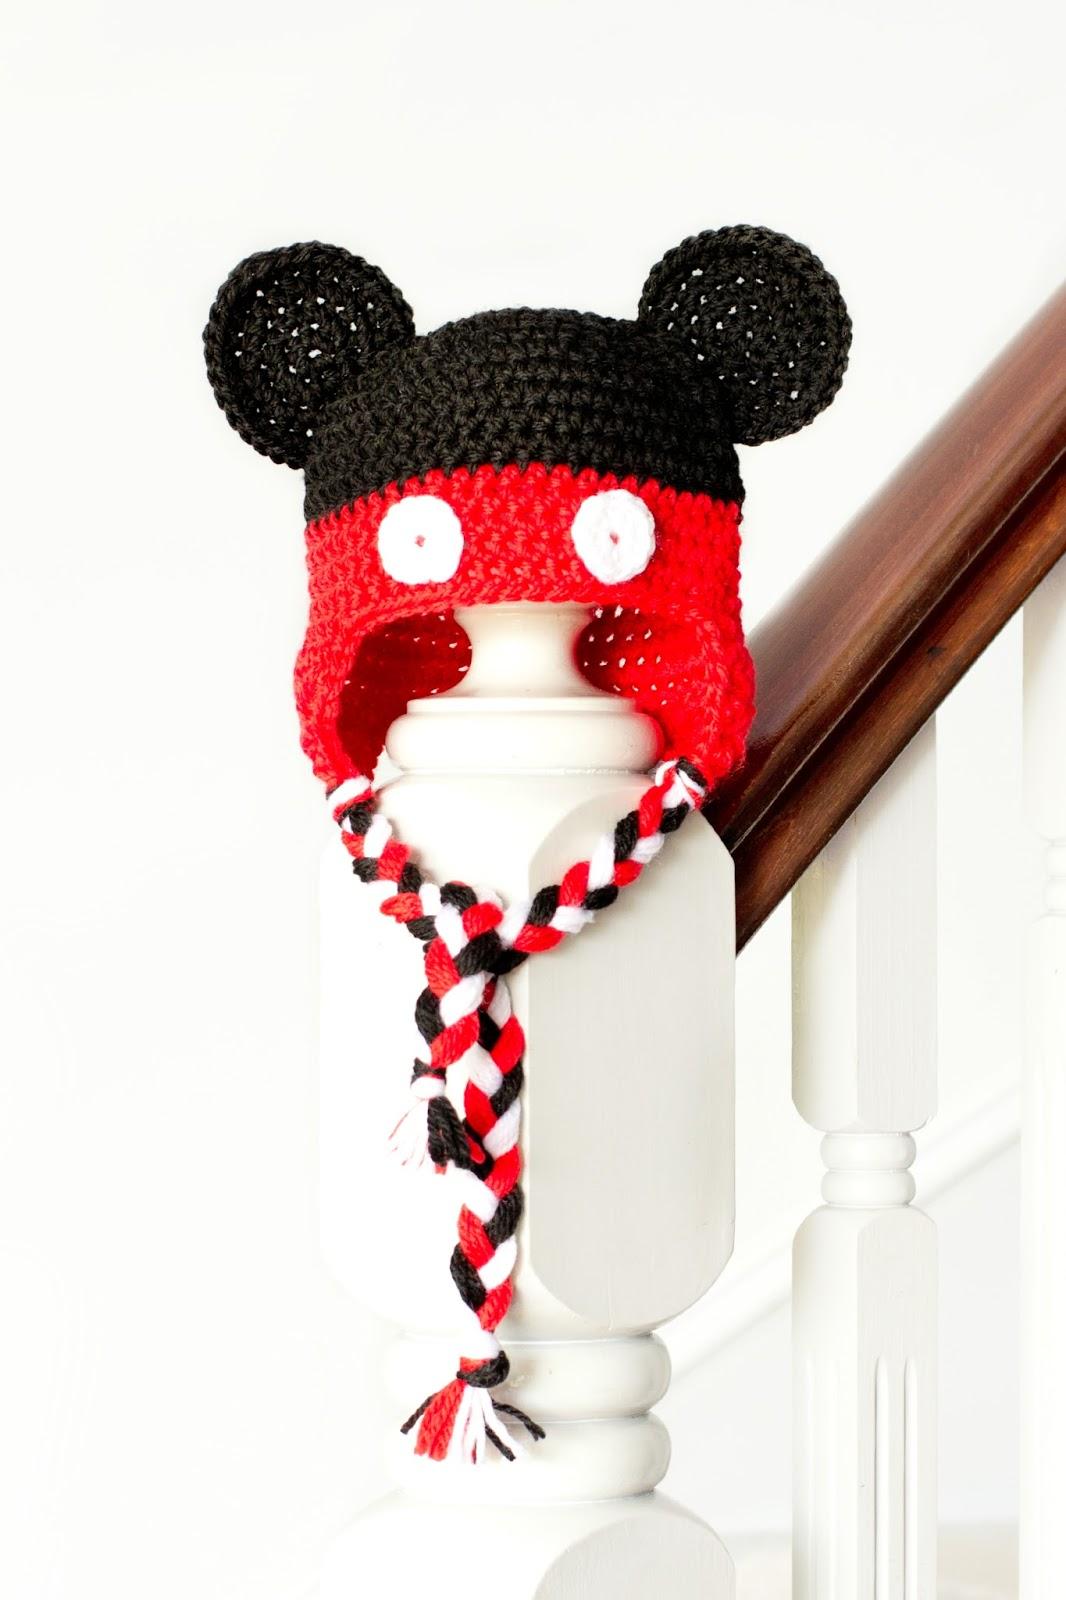 Crochet Baby Hat With Ears Free Pattern